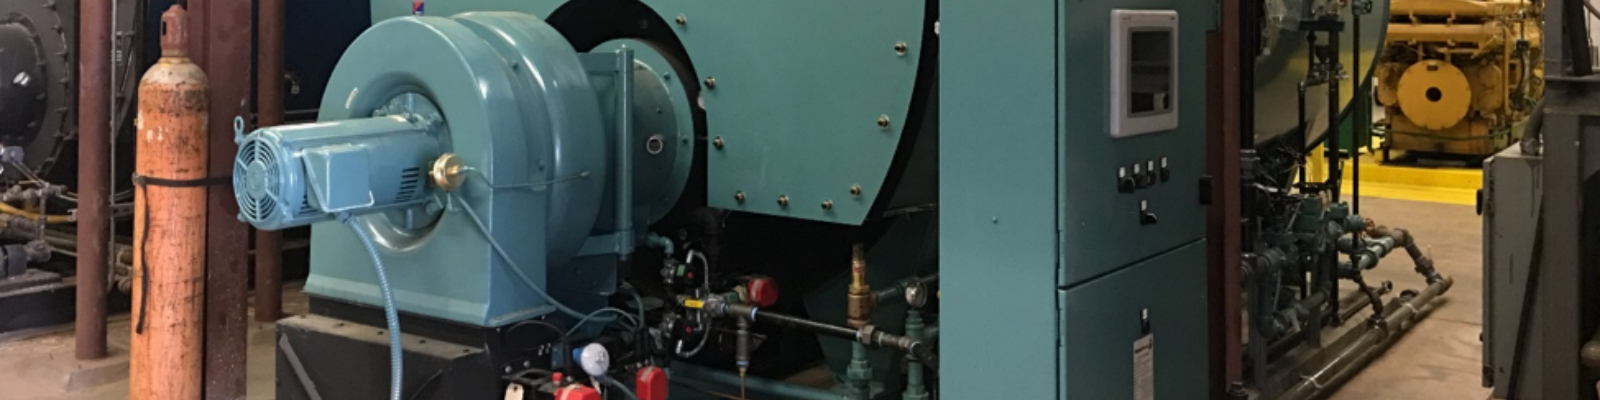 Commercial Boiler Burners Banner